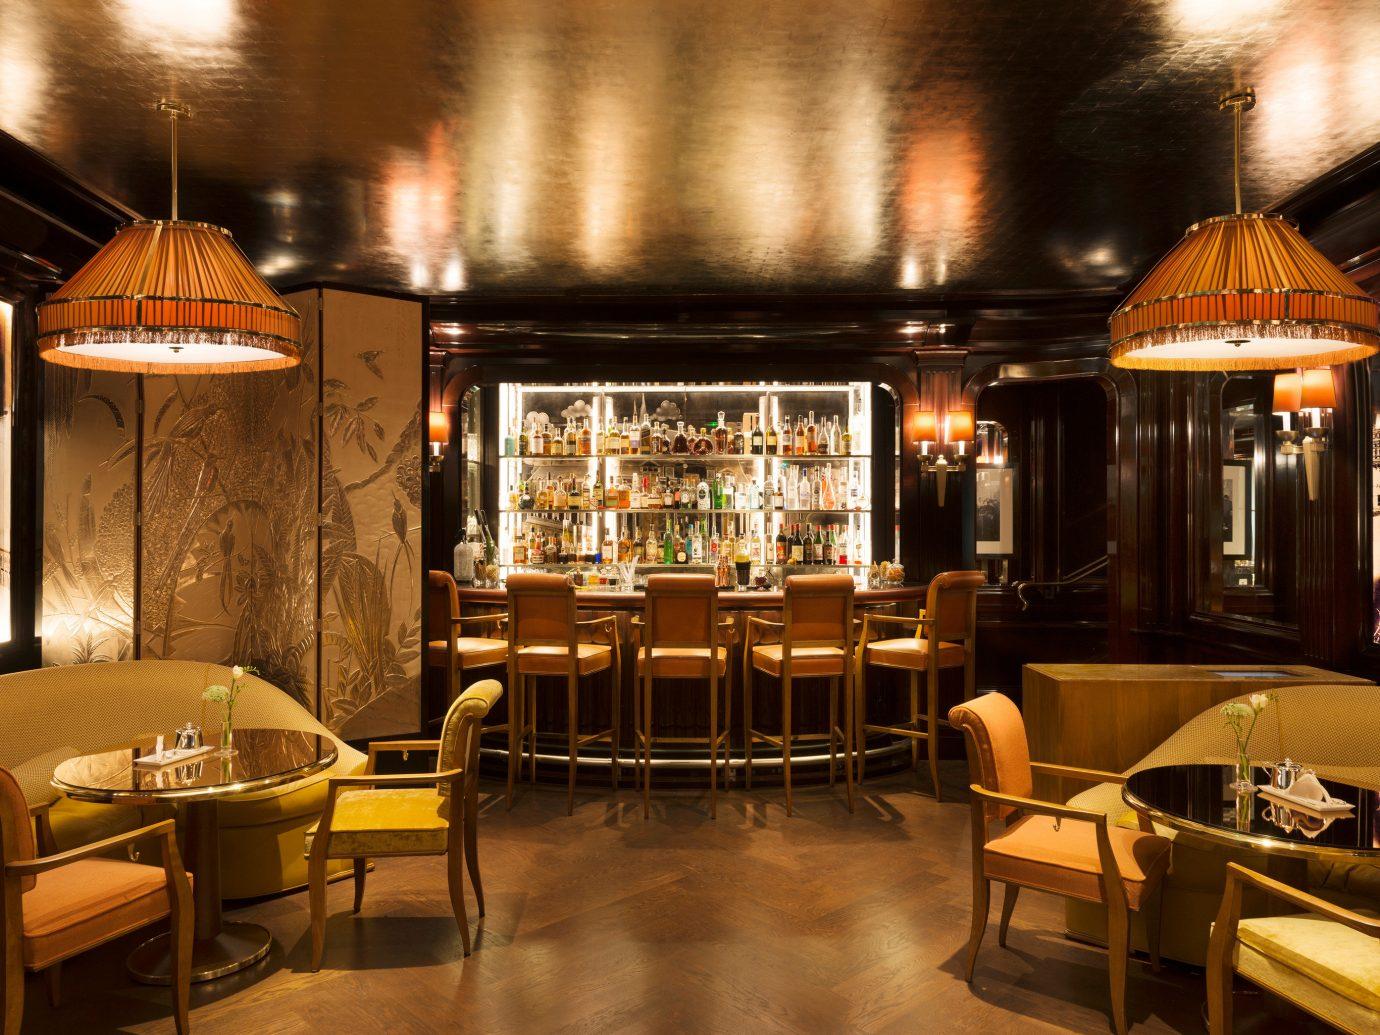 Food + Drink Hotels Trip Ideas floor indoor Bar restaurant café interior design estate coffeehouse meal Lobby furniture